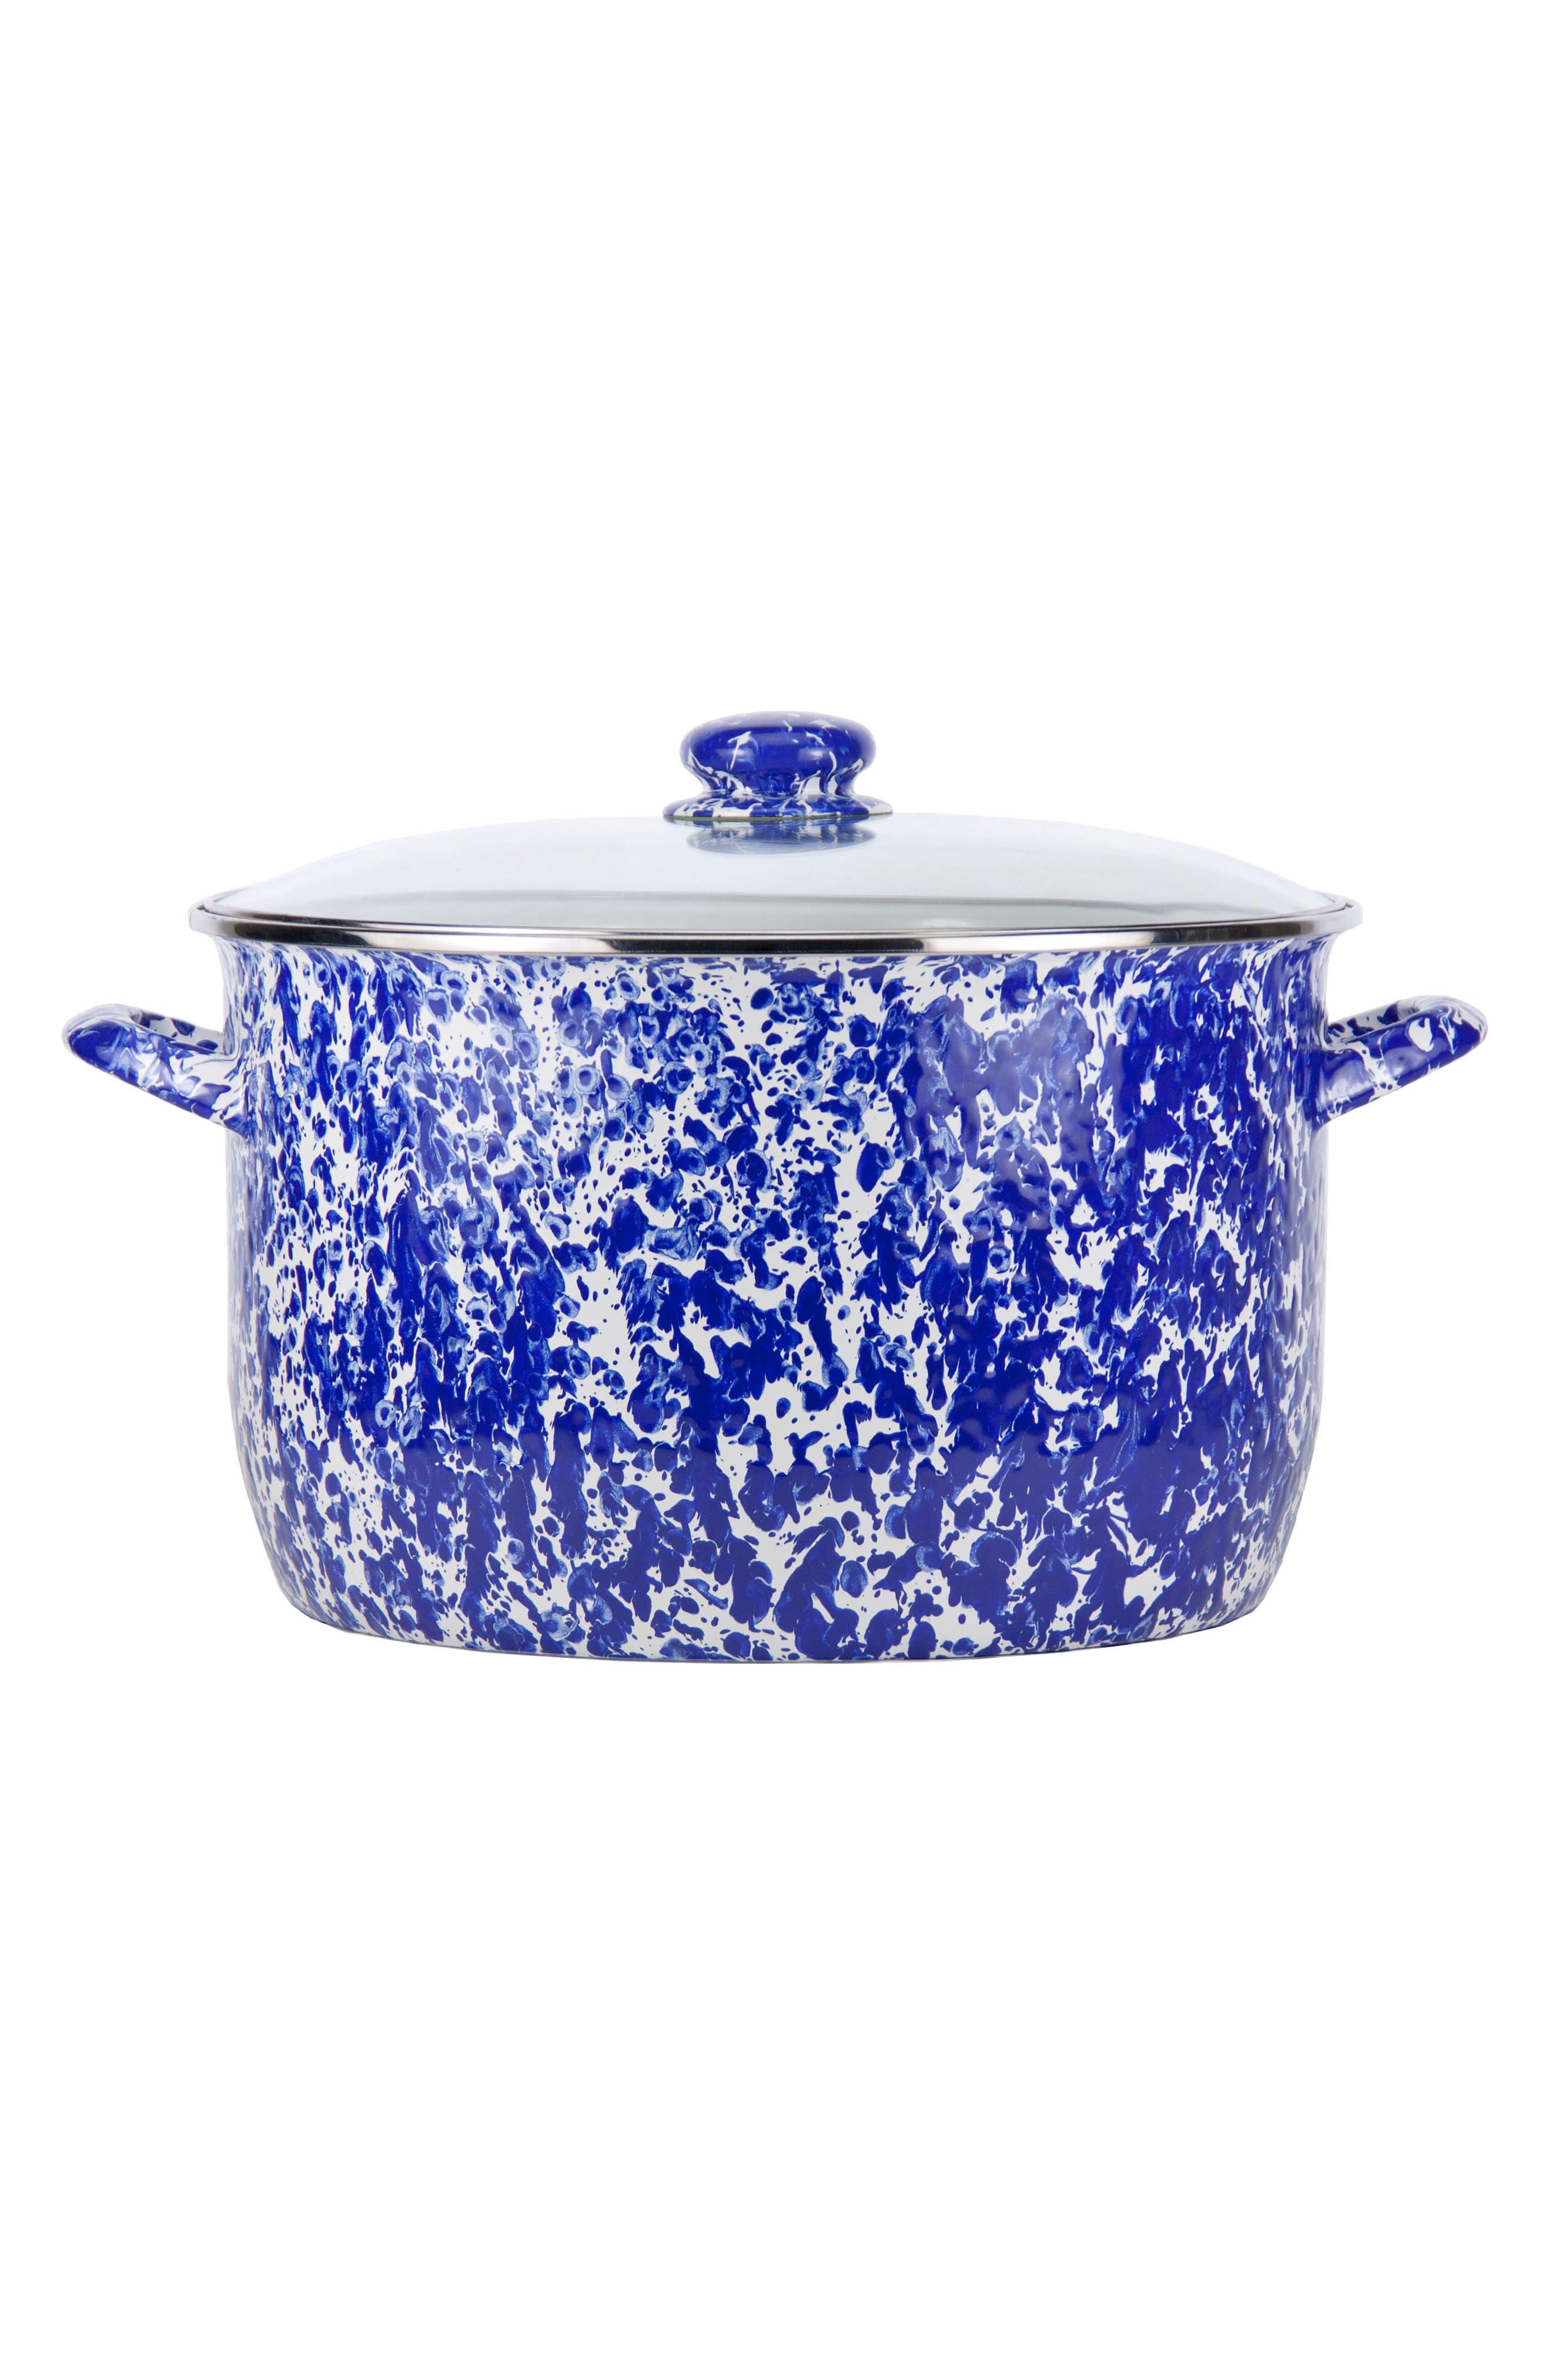 18-Quart Stock Pot,                         Main,                         color, BLUE SWIRL